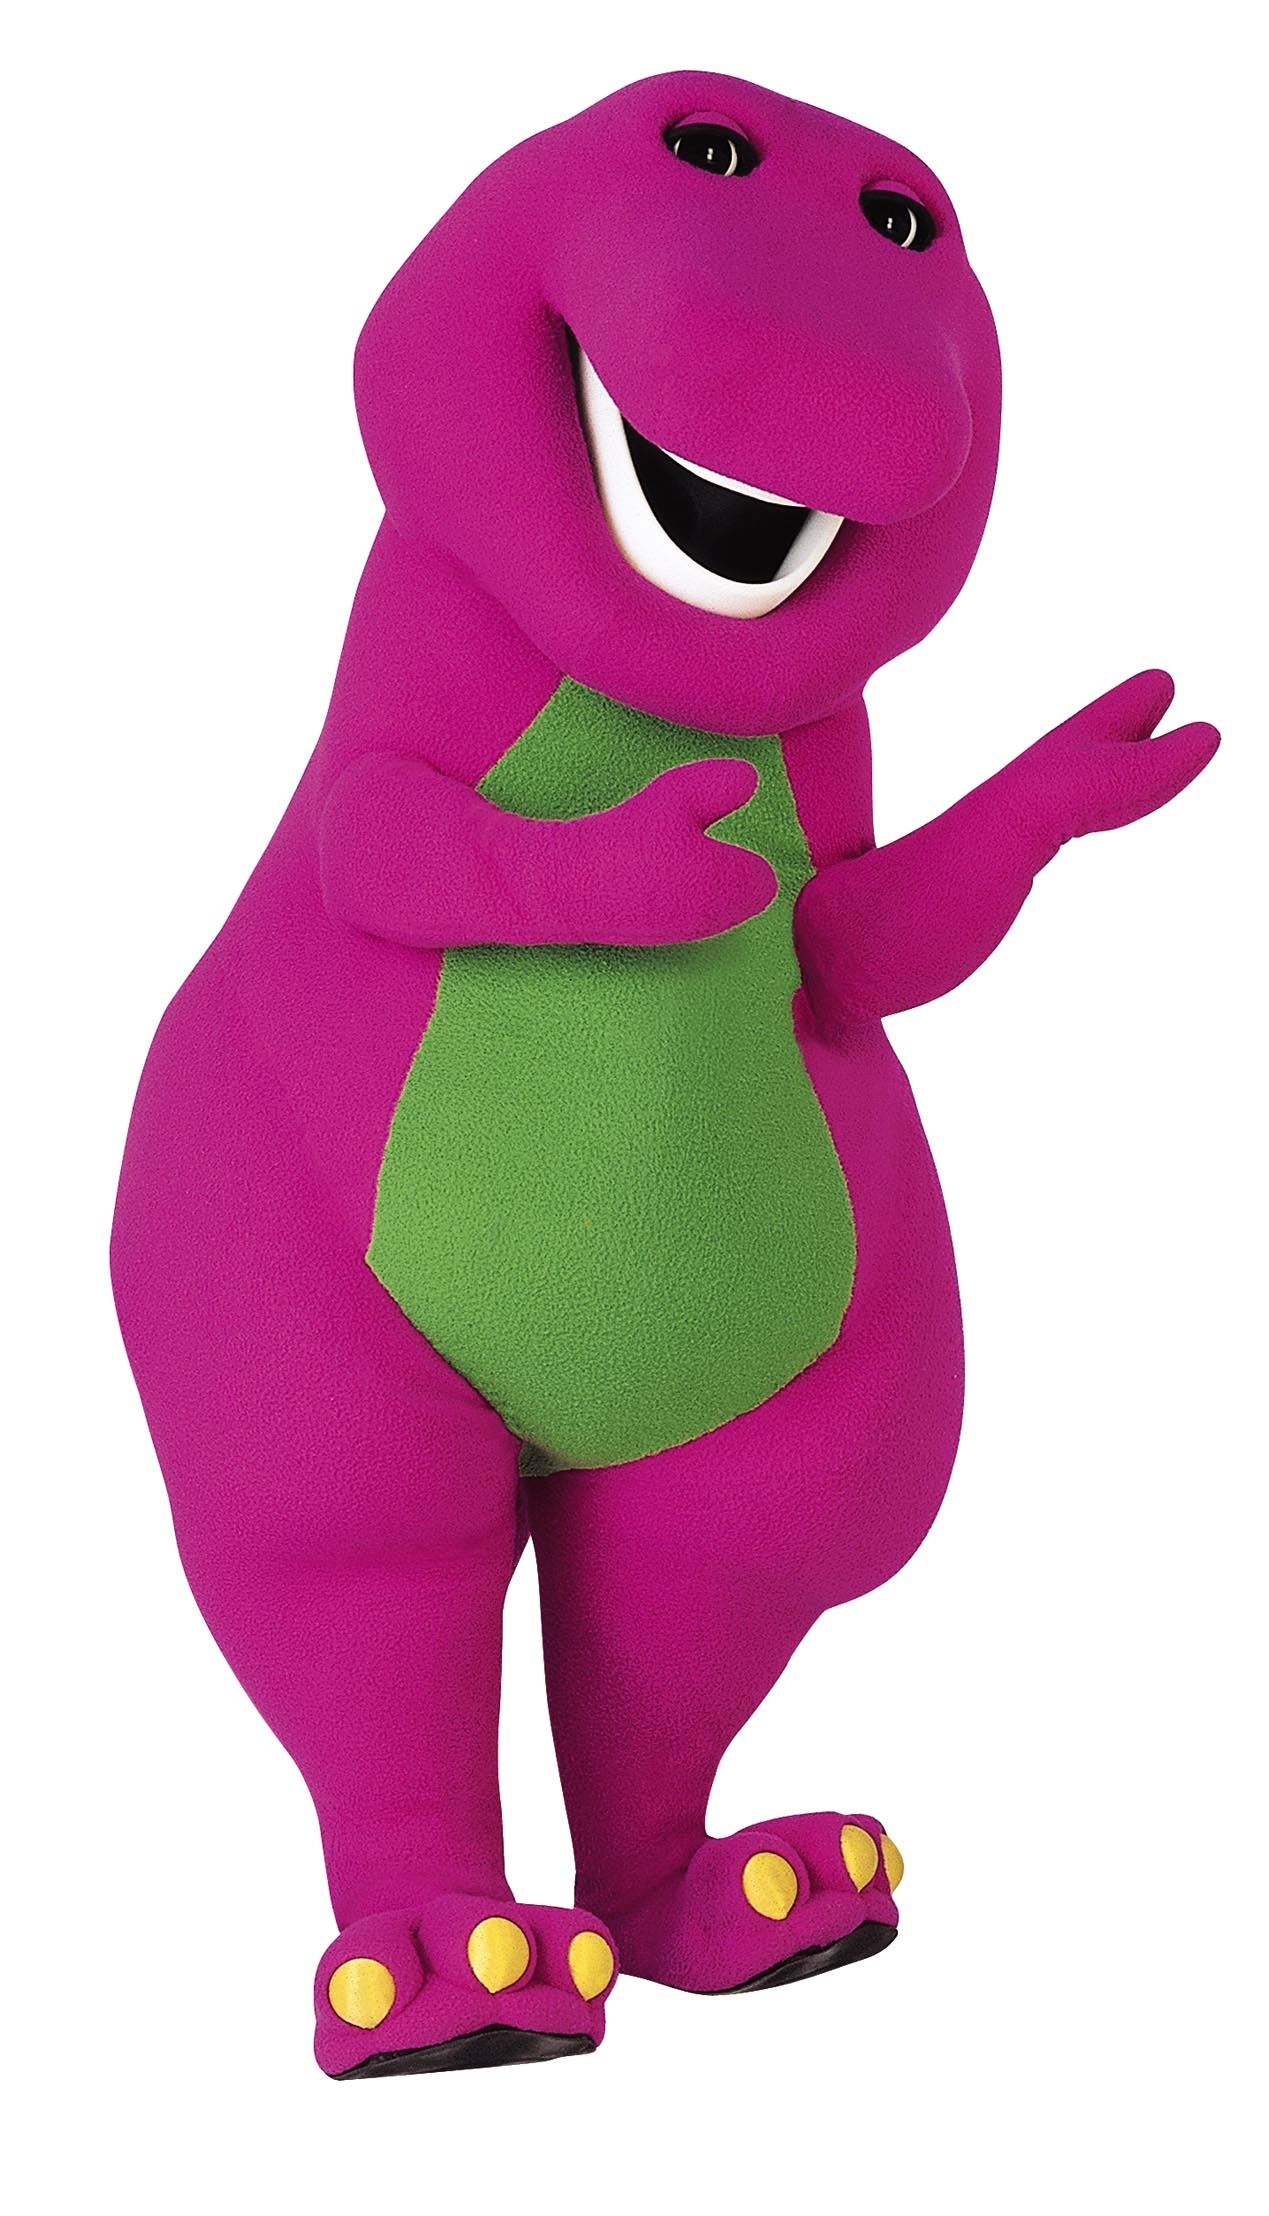 [Image: Barney.jpg]